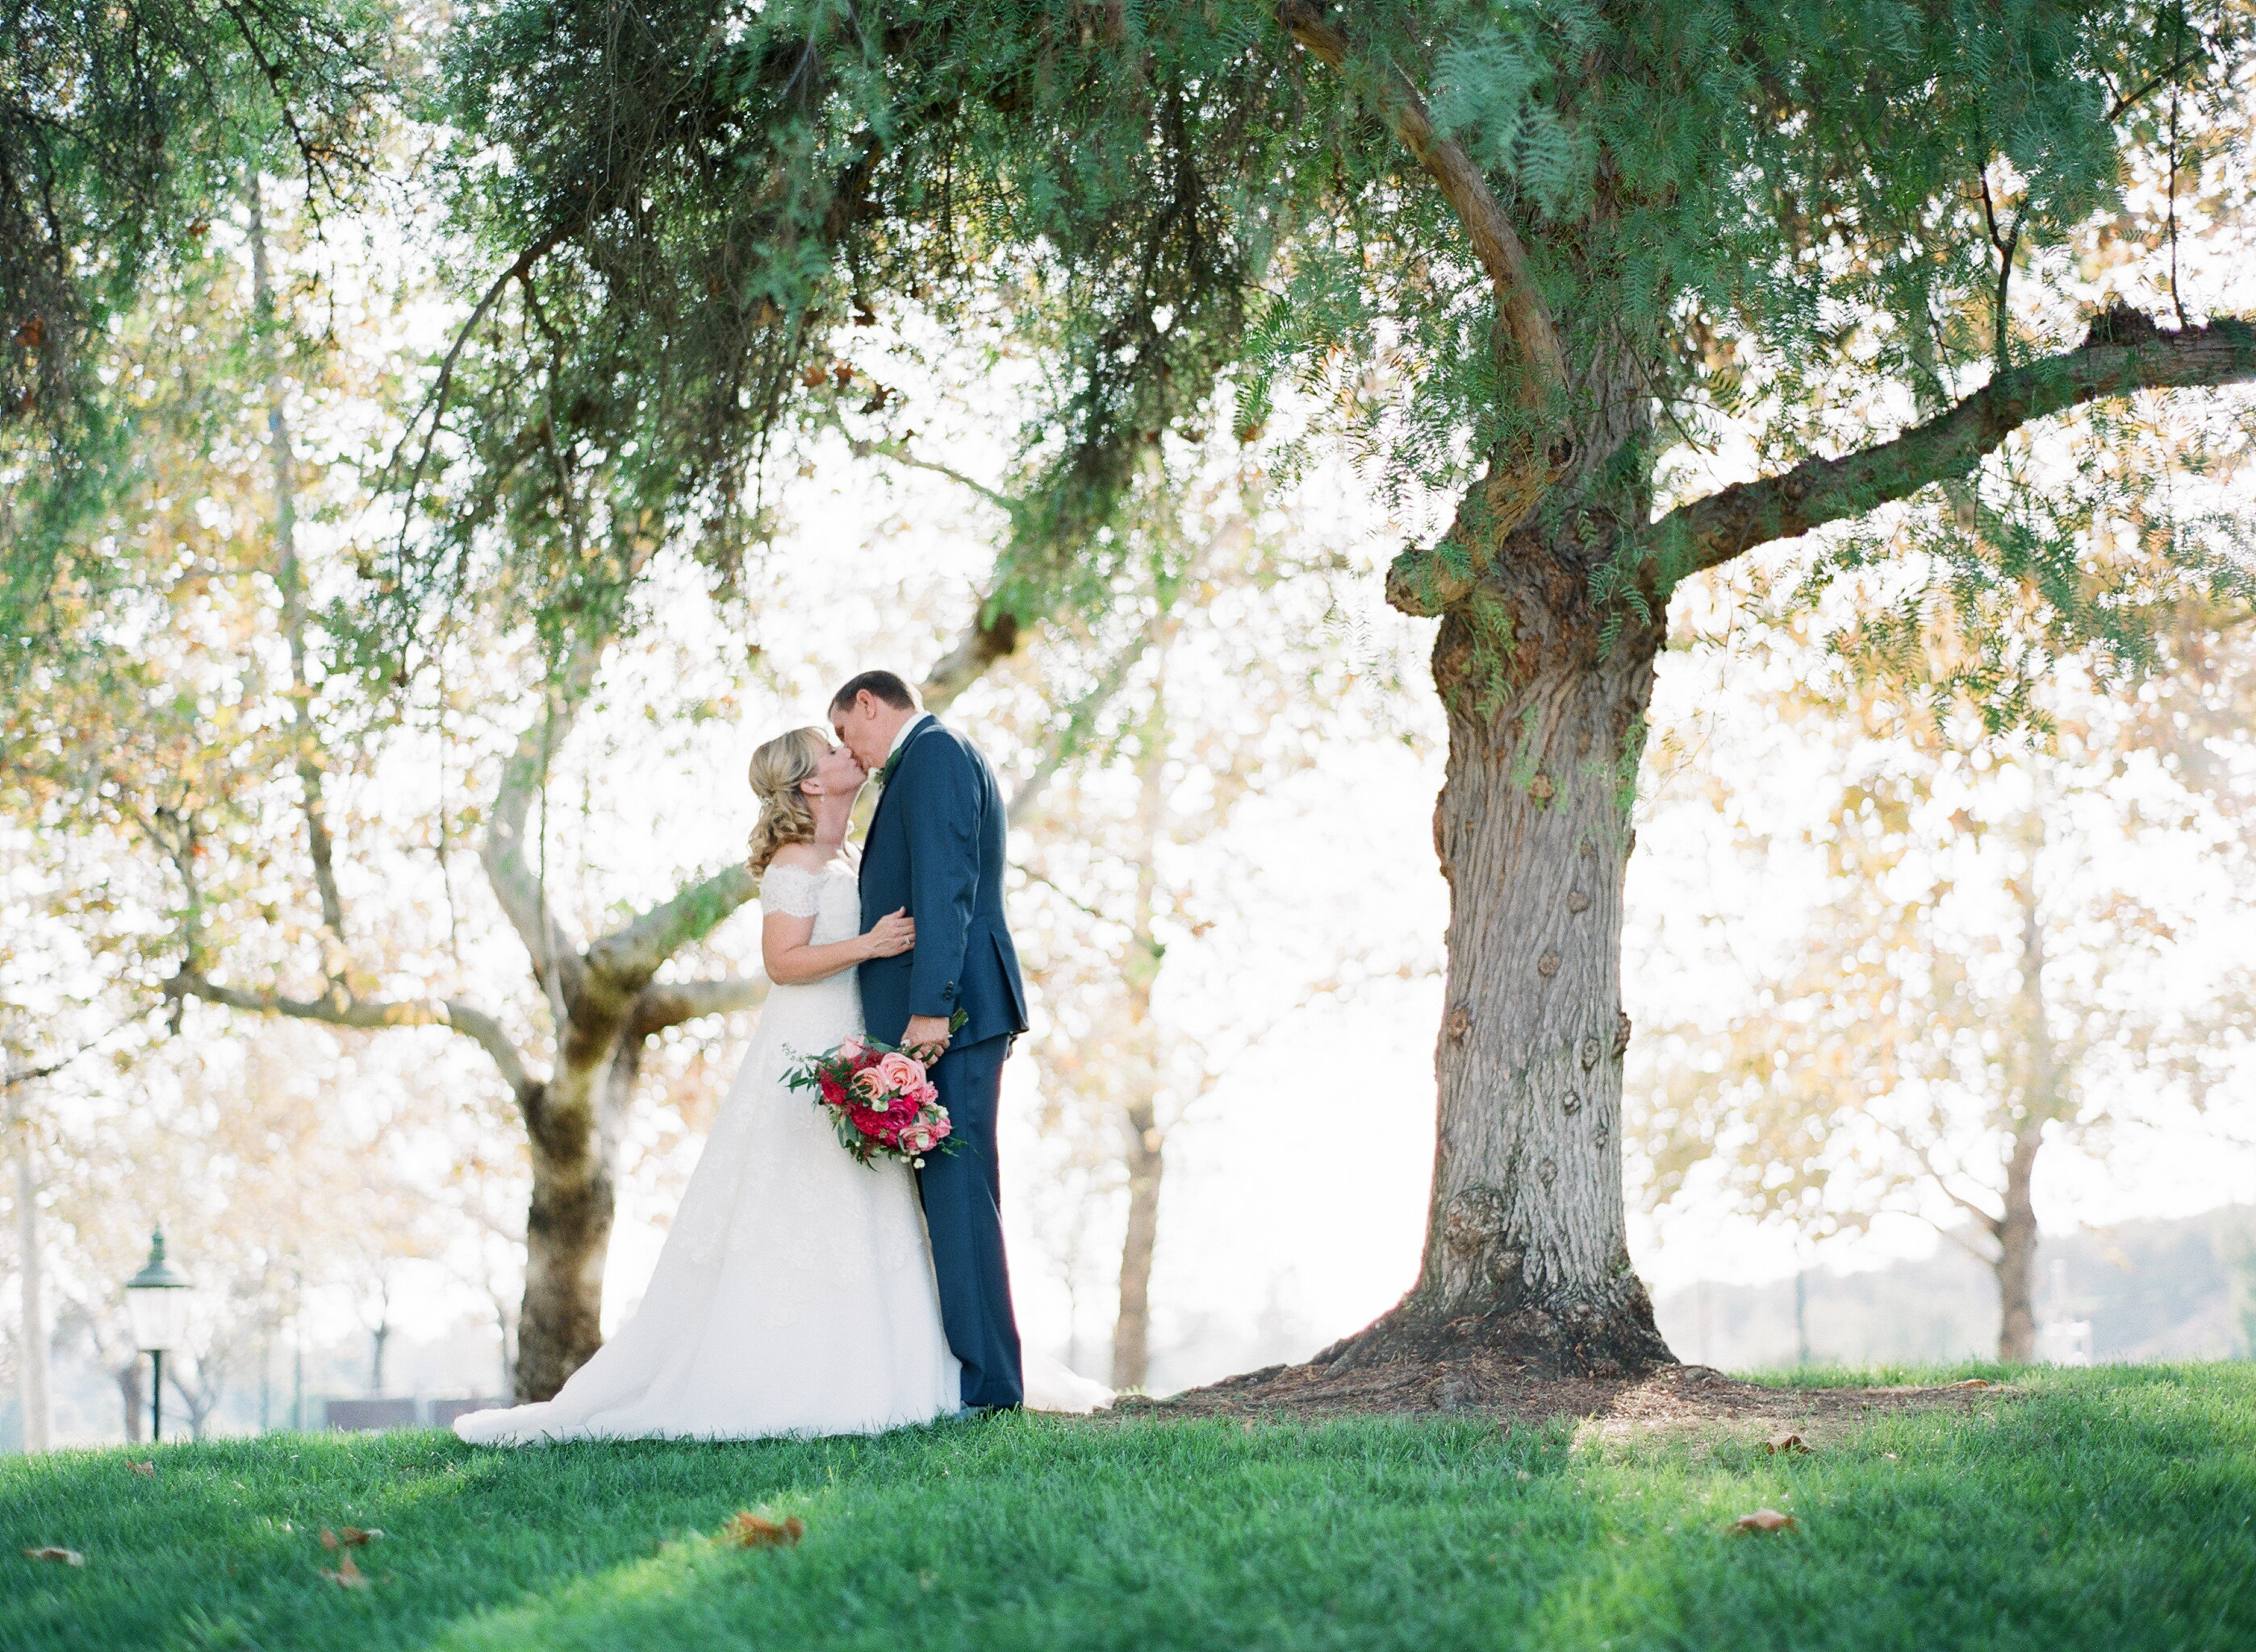 wedding review fullerton wedding orange county wedding planner bowtie and bloom